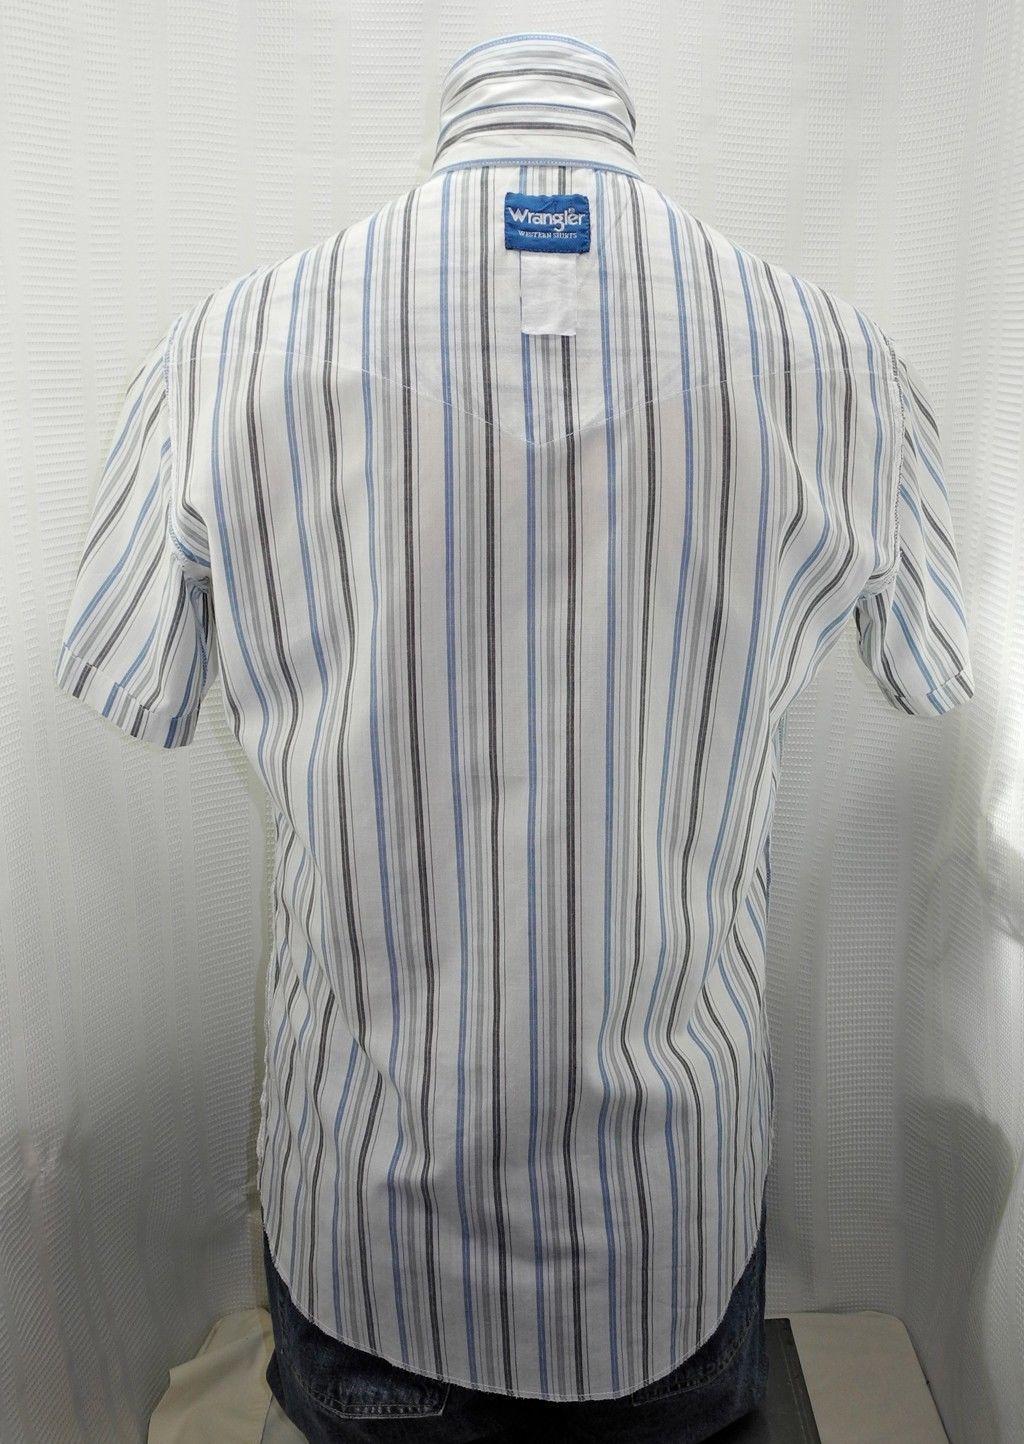 Wrangler Western Blue Grey White Striped Snap-Front Short Sleeve Shirt-Men's M/L